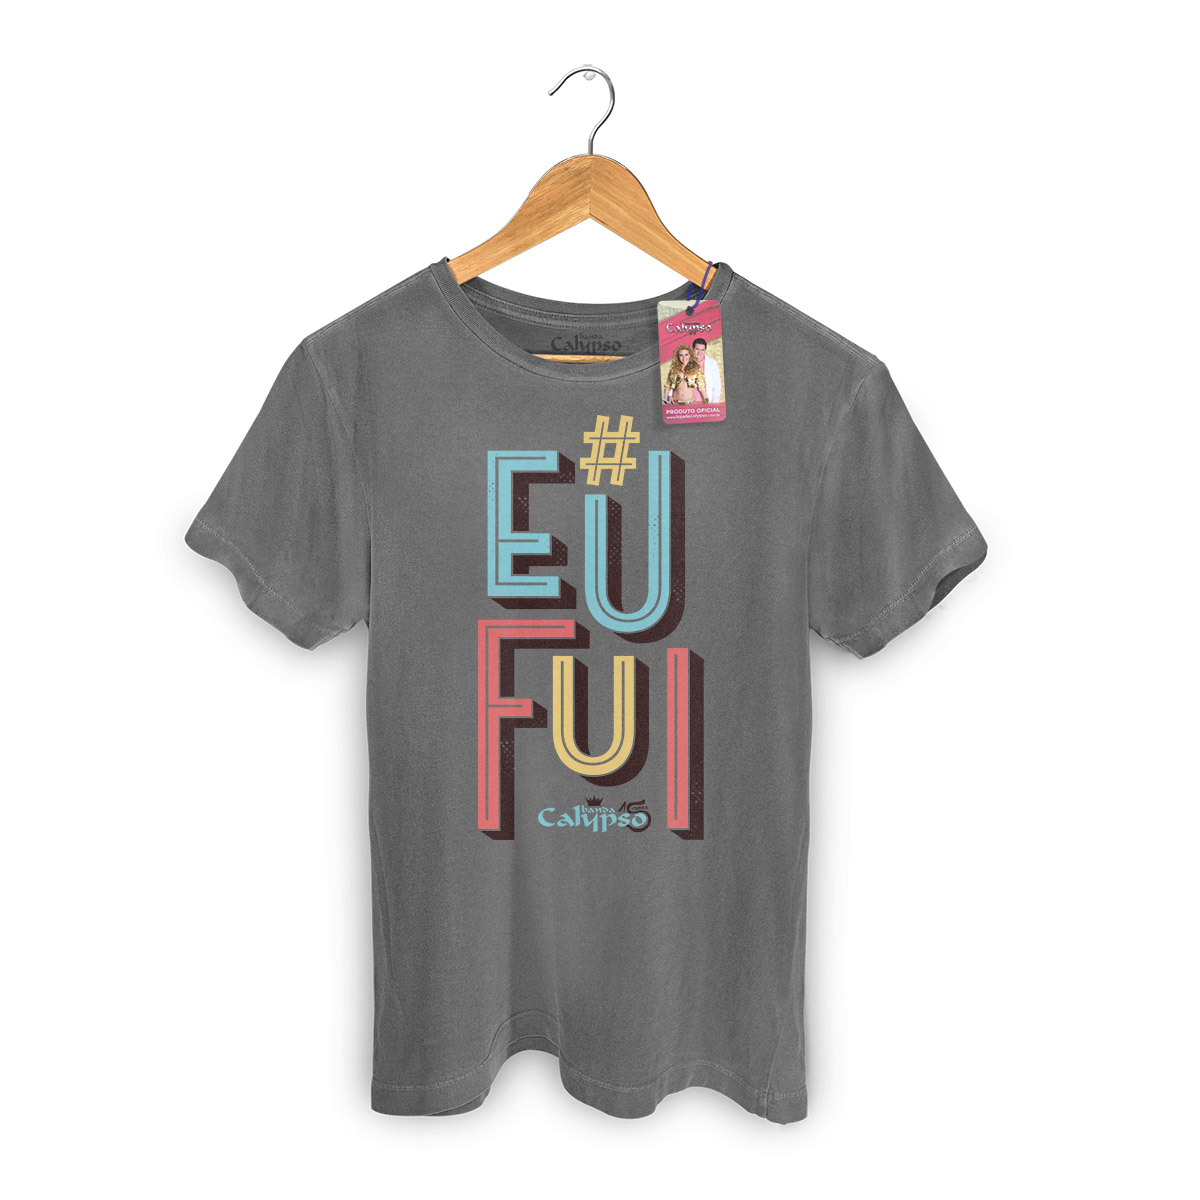 T-shirt Premium Masculina Calypso Eu Fui